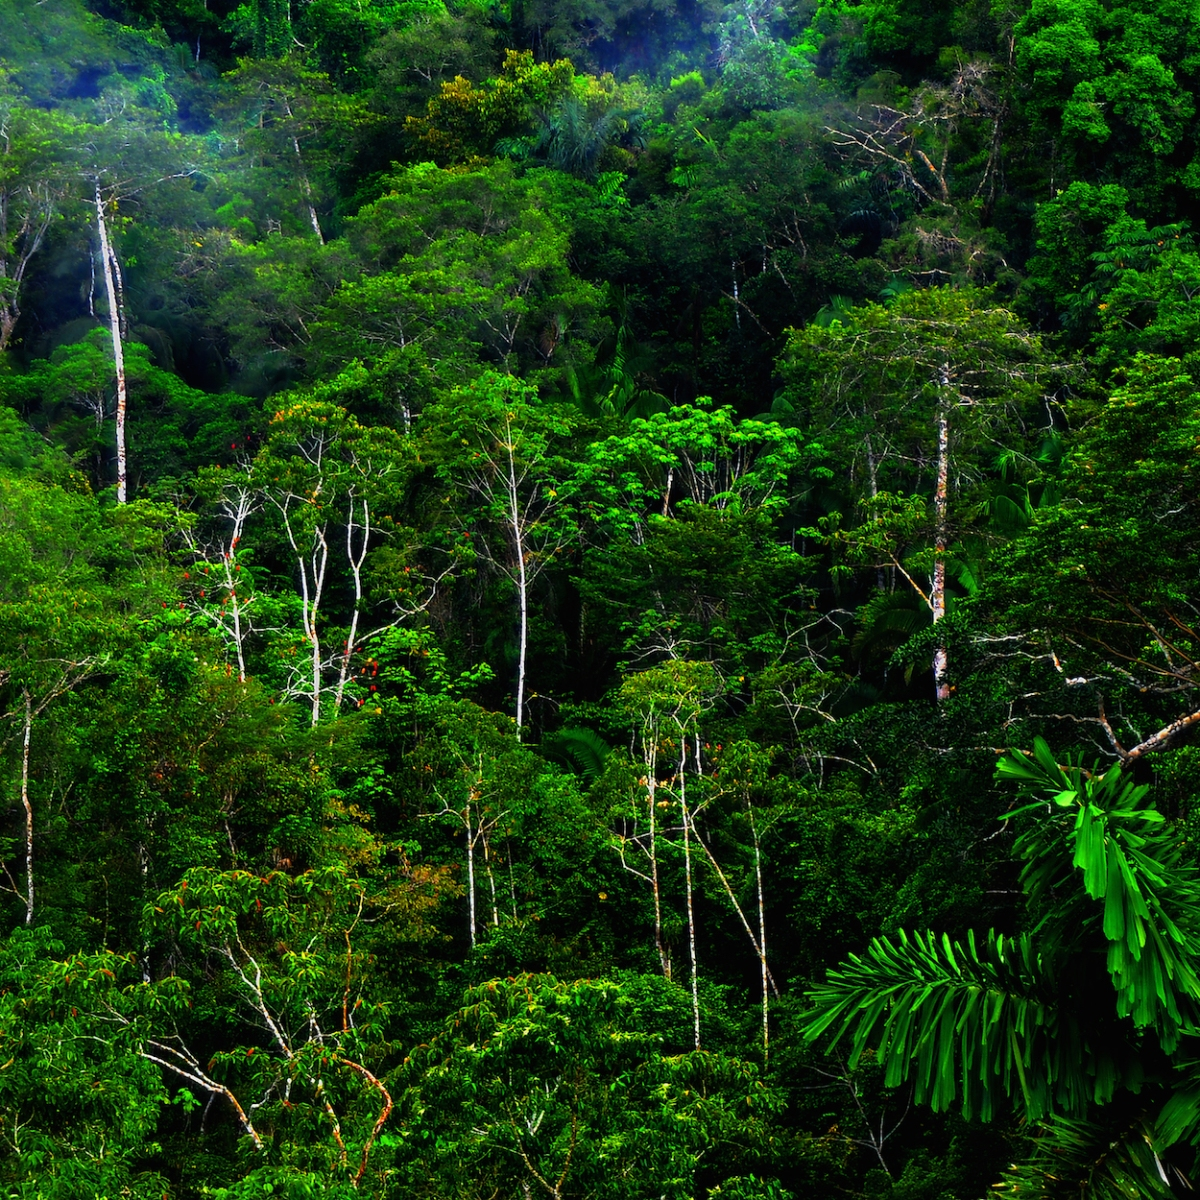 6 ways Brazil is saving the Amazon